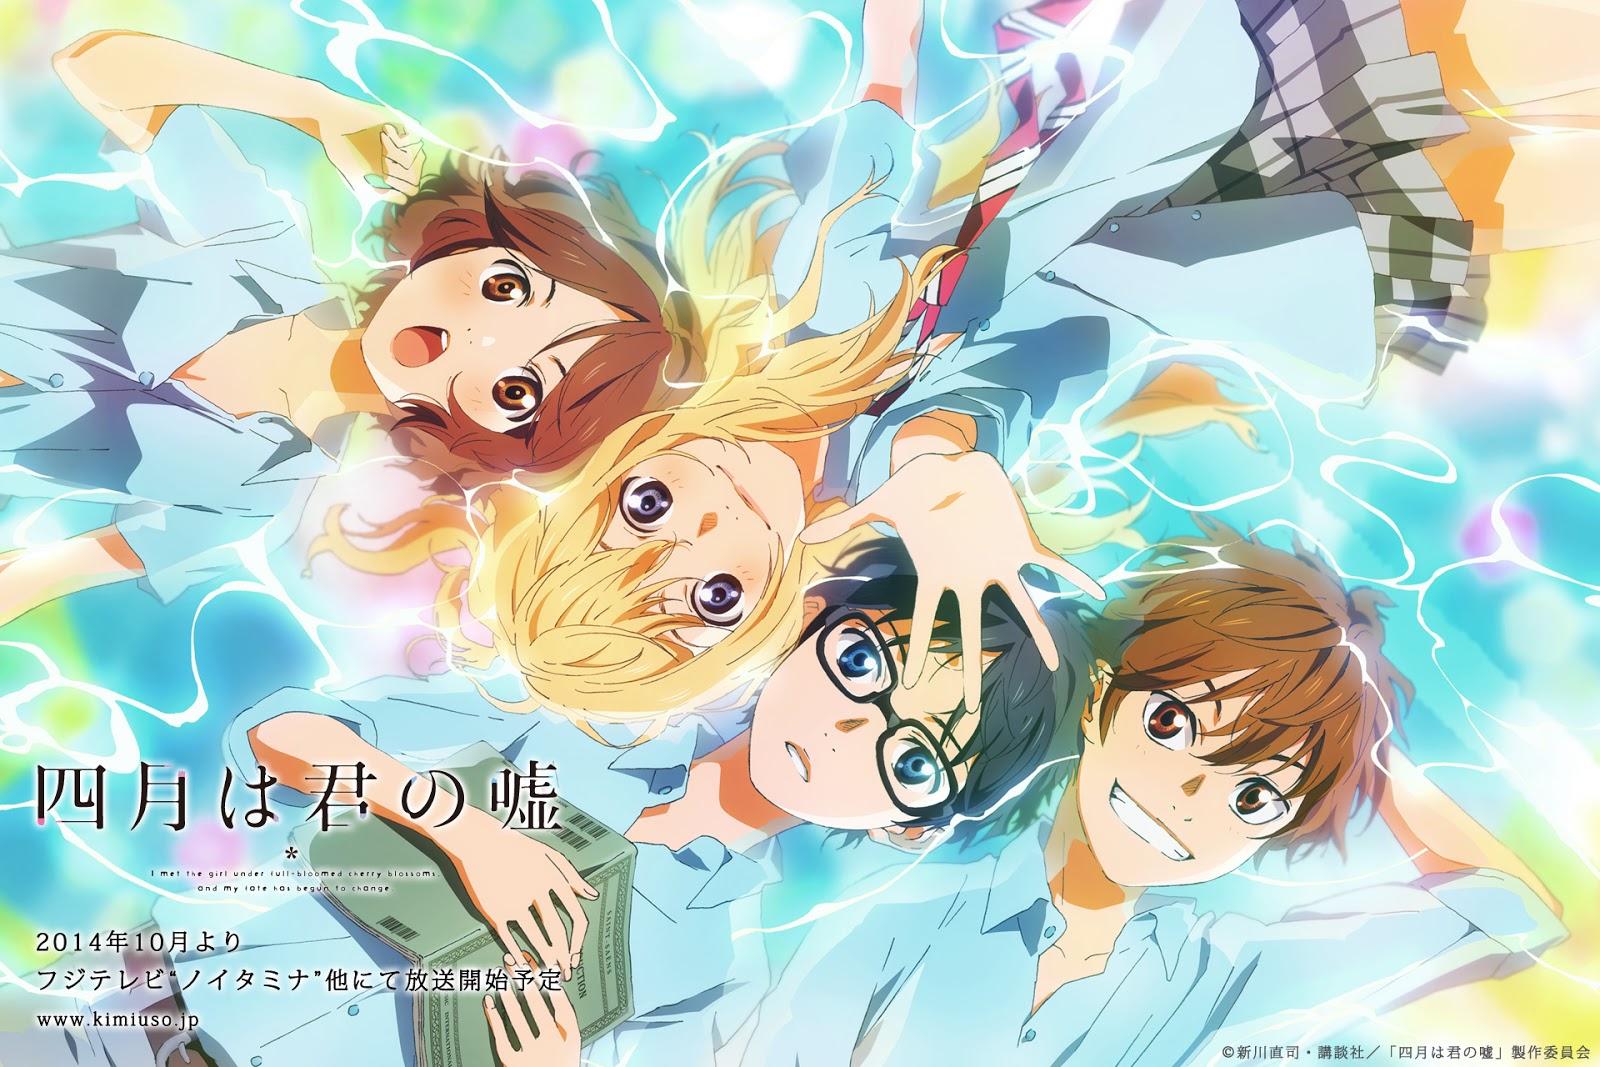 Singable English Lyrics For Anime Hikaru Nara If We Shine